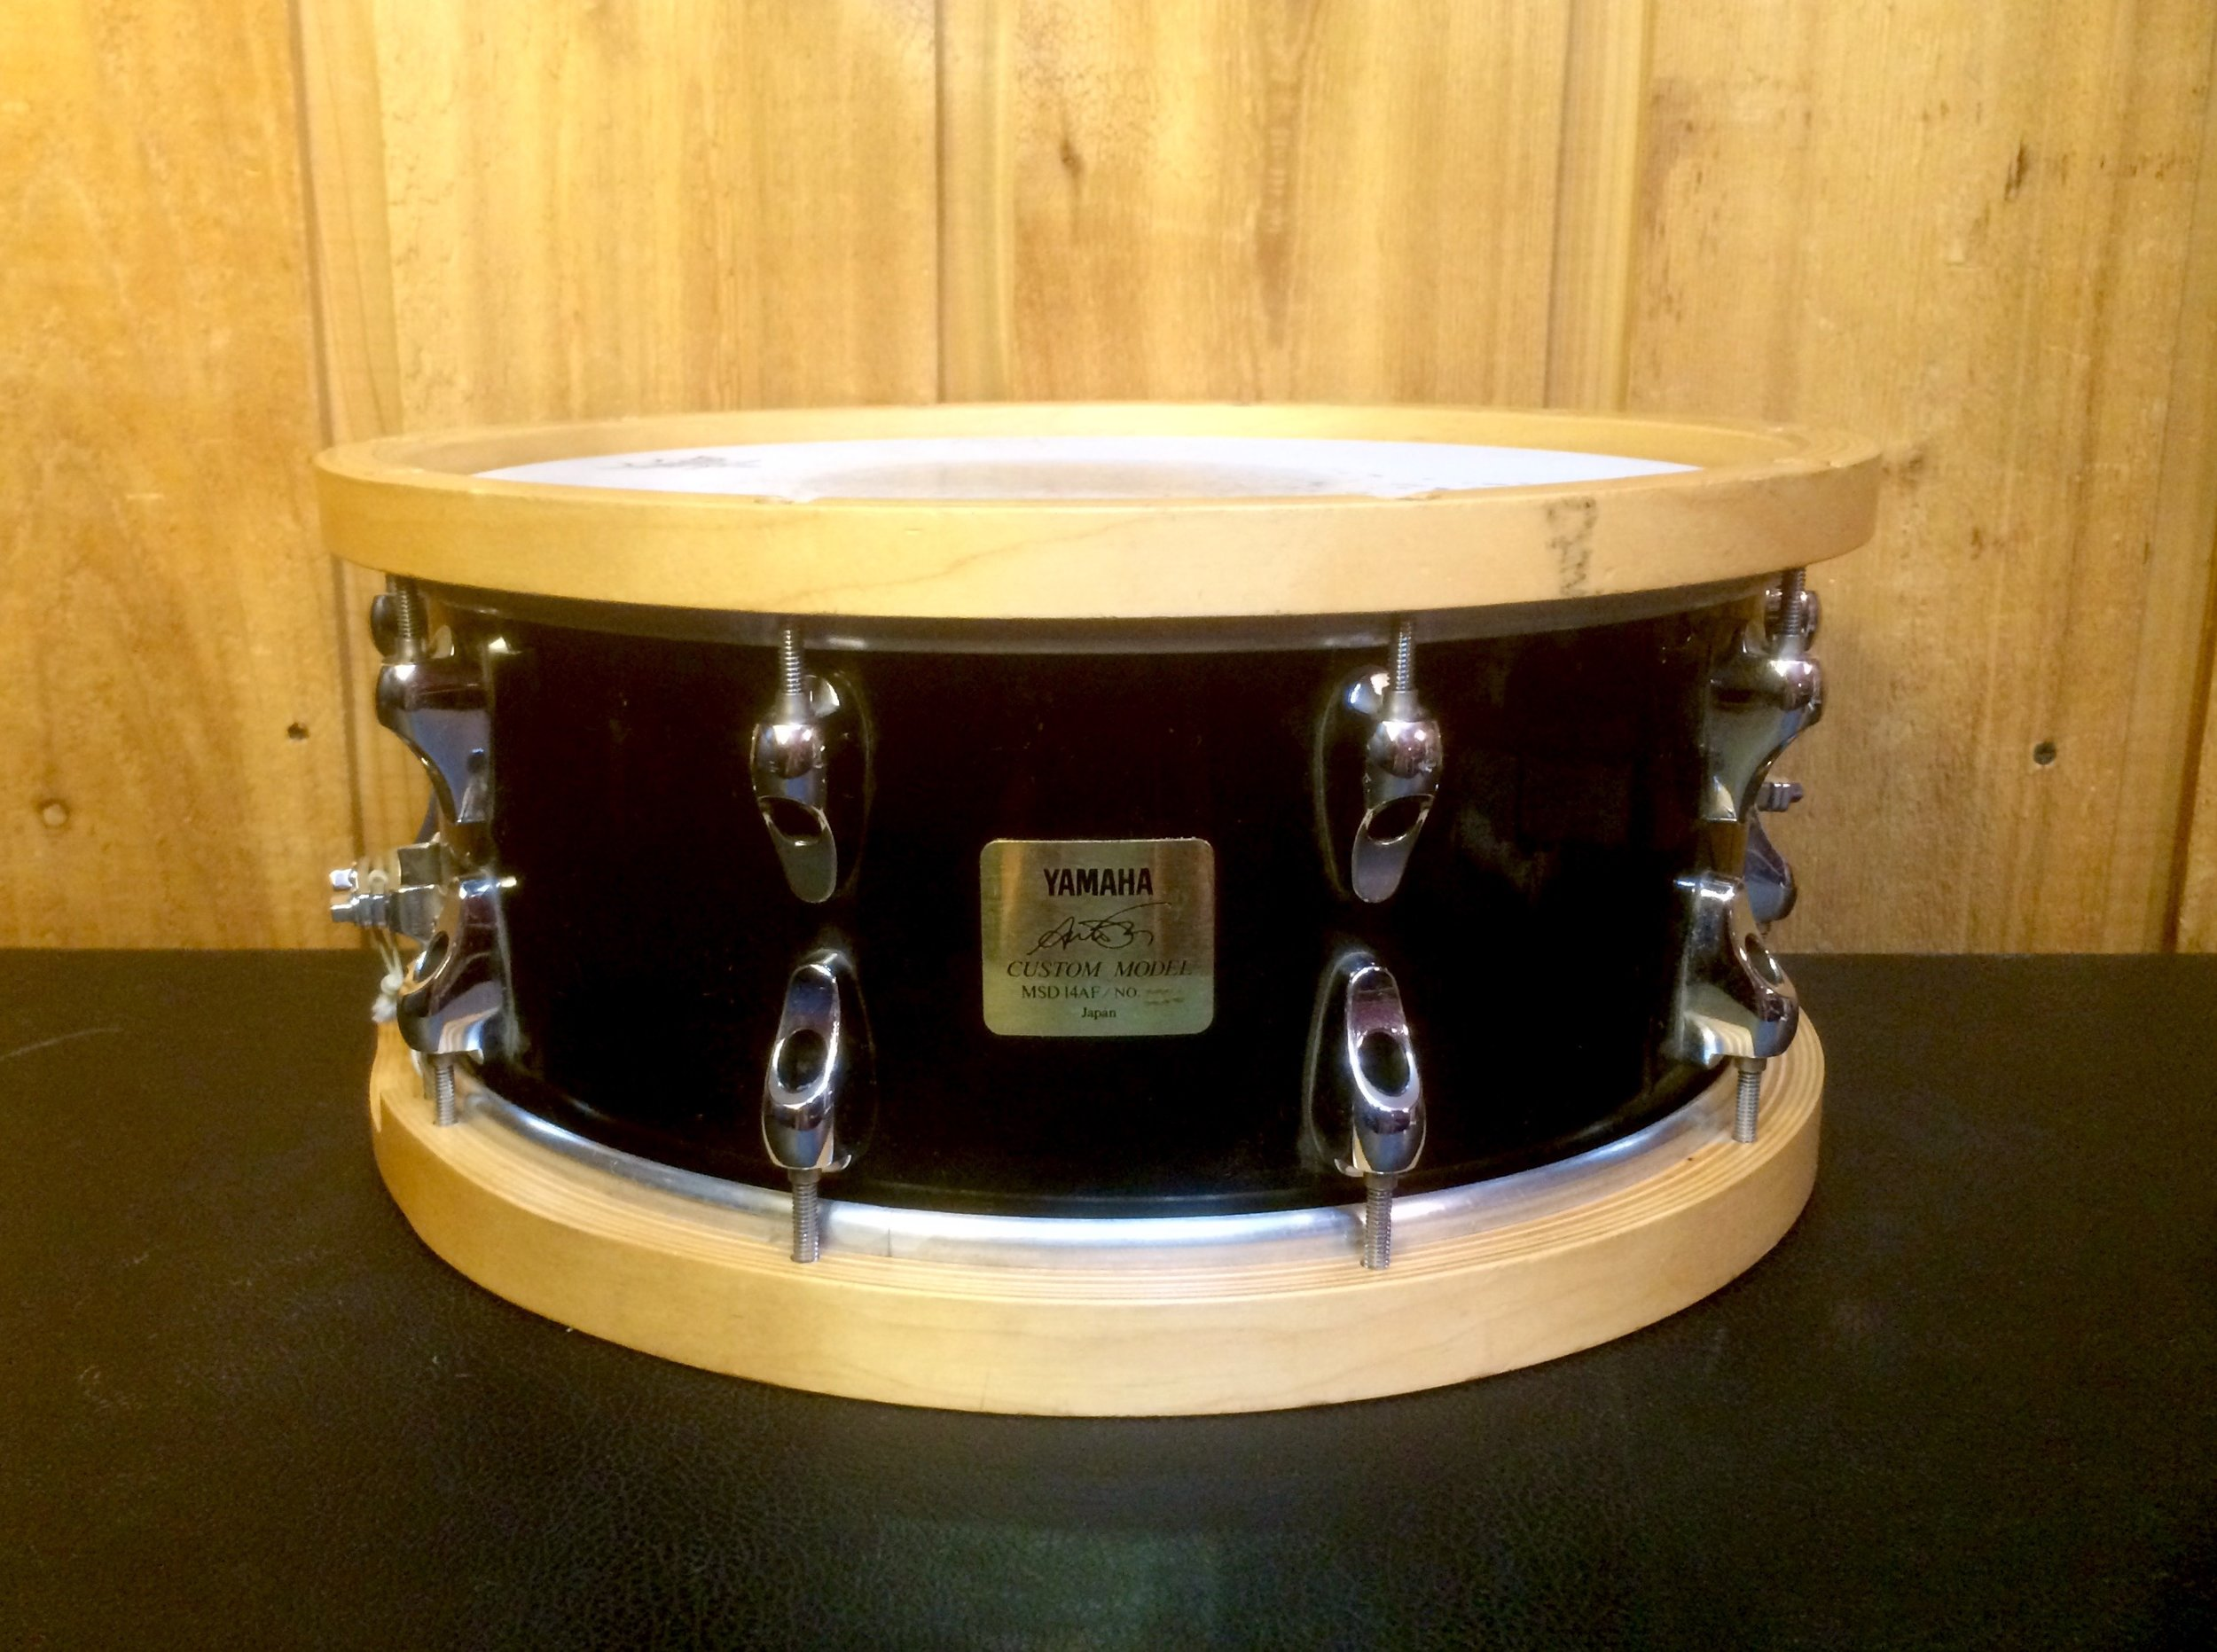 Yamaha Anton Fig Signature Snare